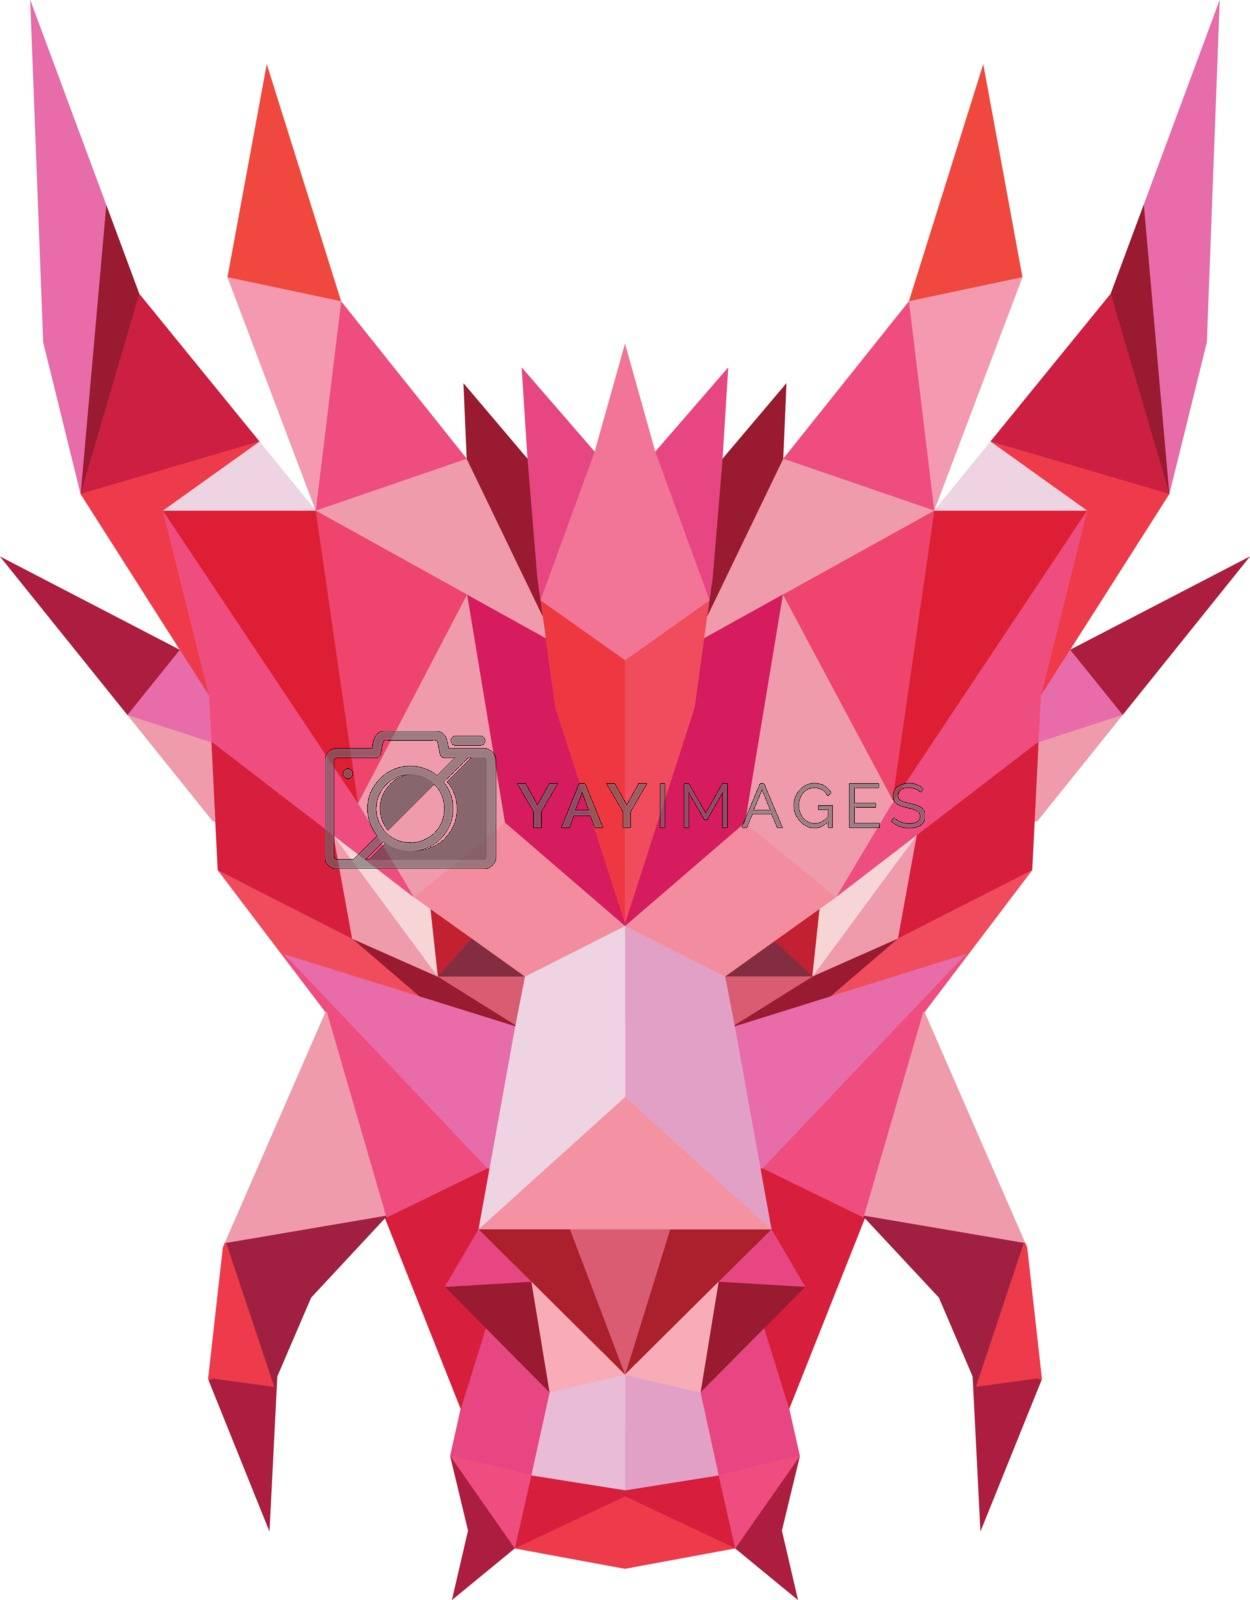 Dragon Head Front Low Polygon Style by patrimonio